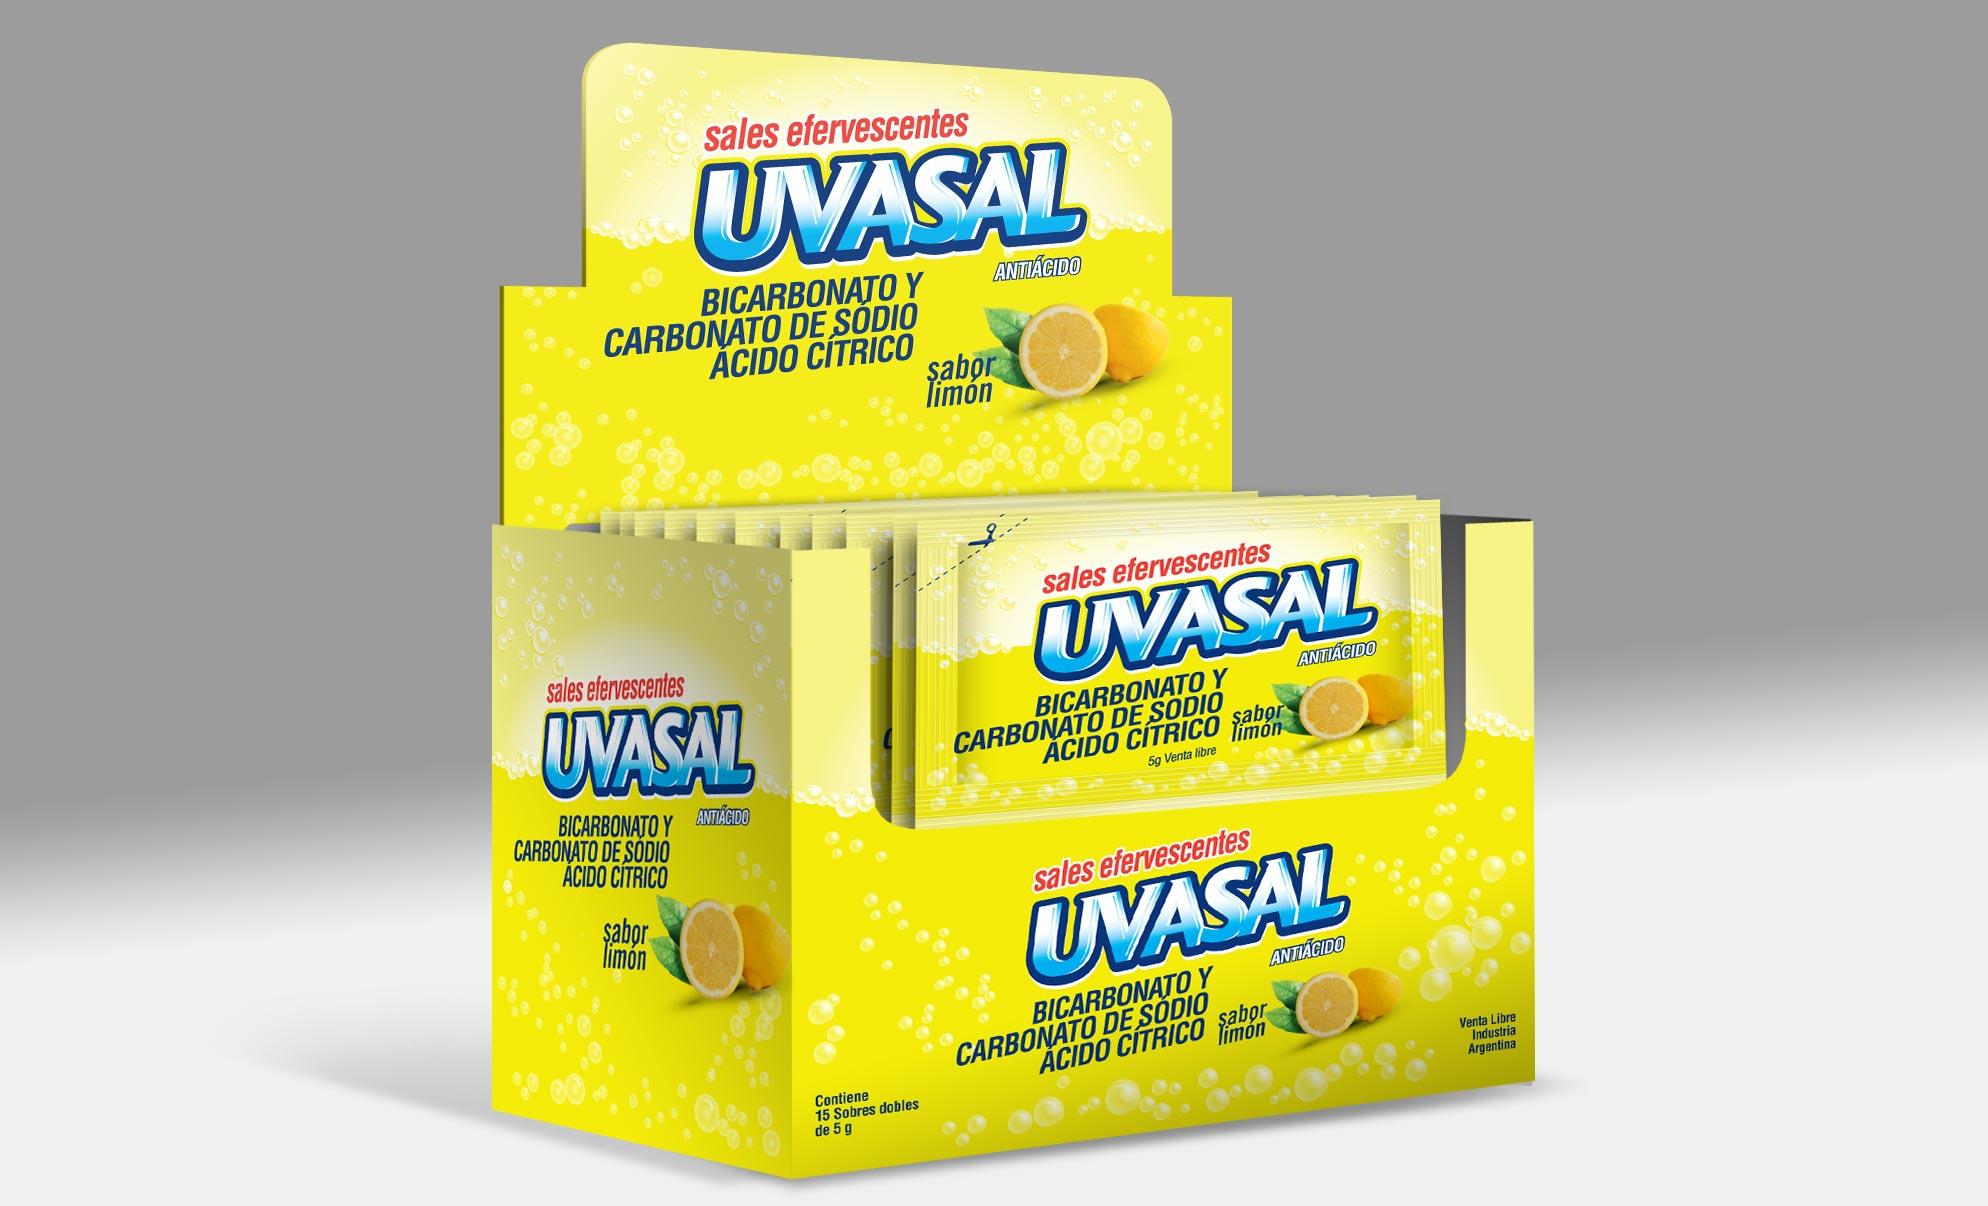 Glaxosmithkline Uvasal Packaging Limón